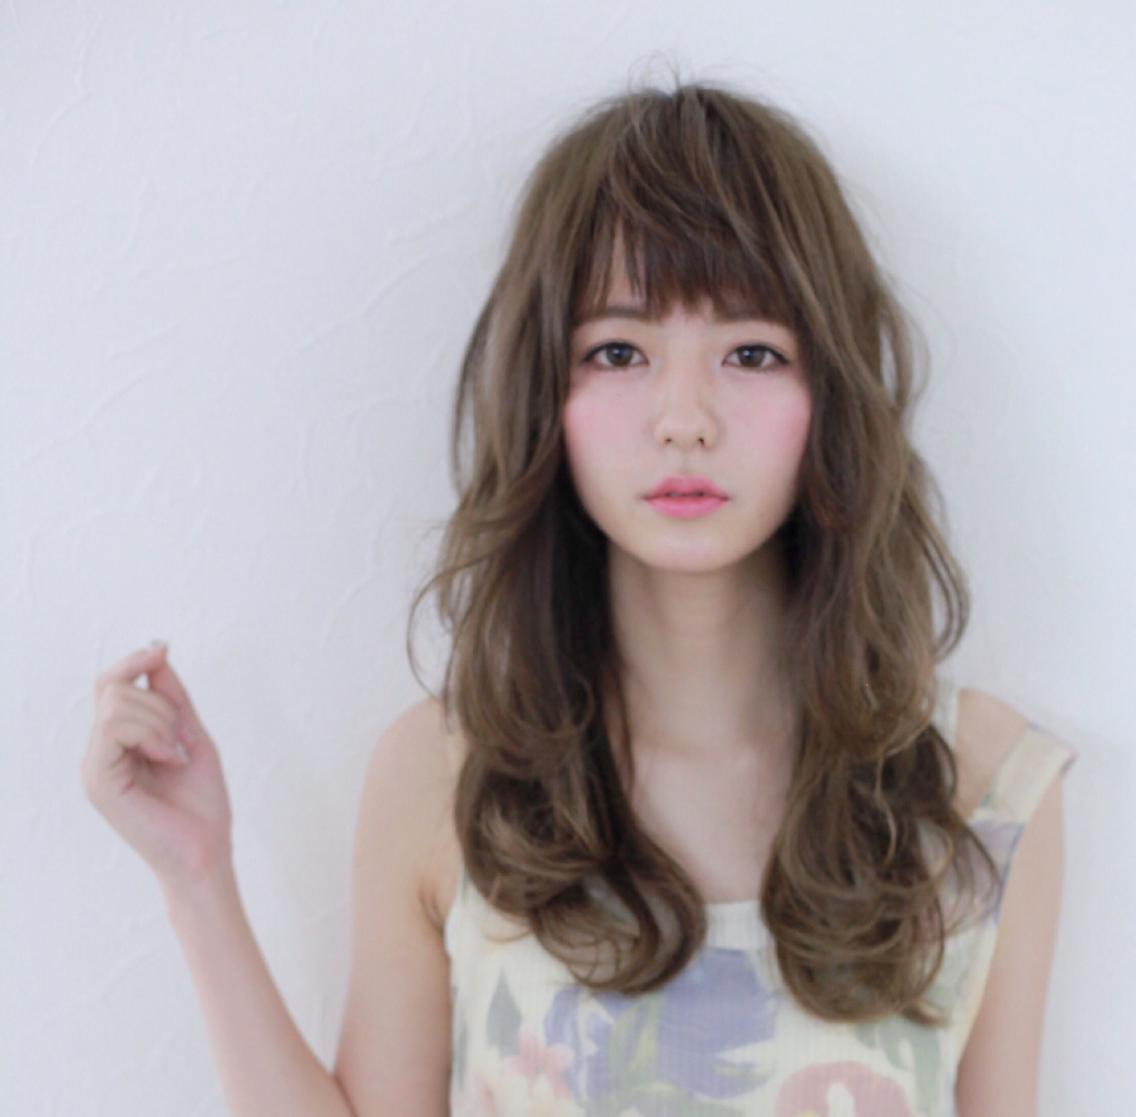 【hair room a-to】地下鉄北大路駅から徒歩3分!minimo限定春特別キャンペーン✨